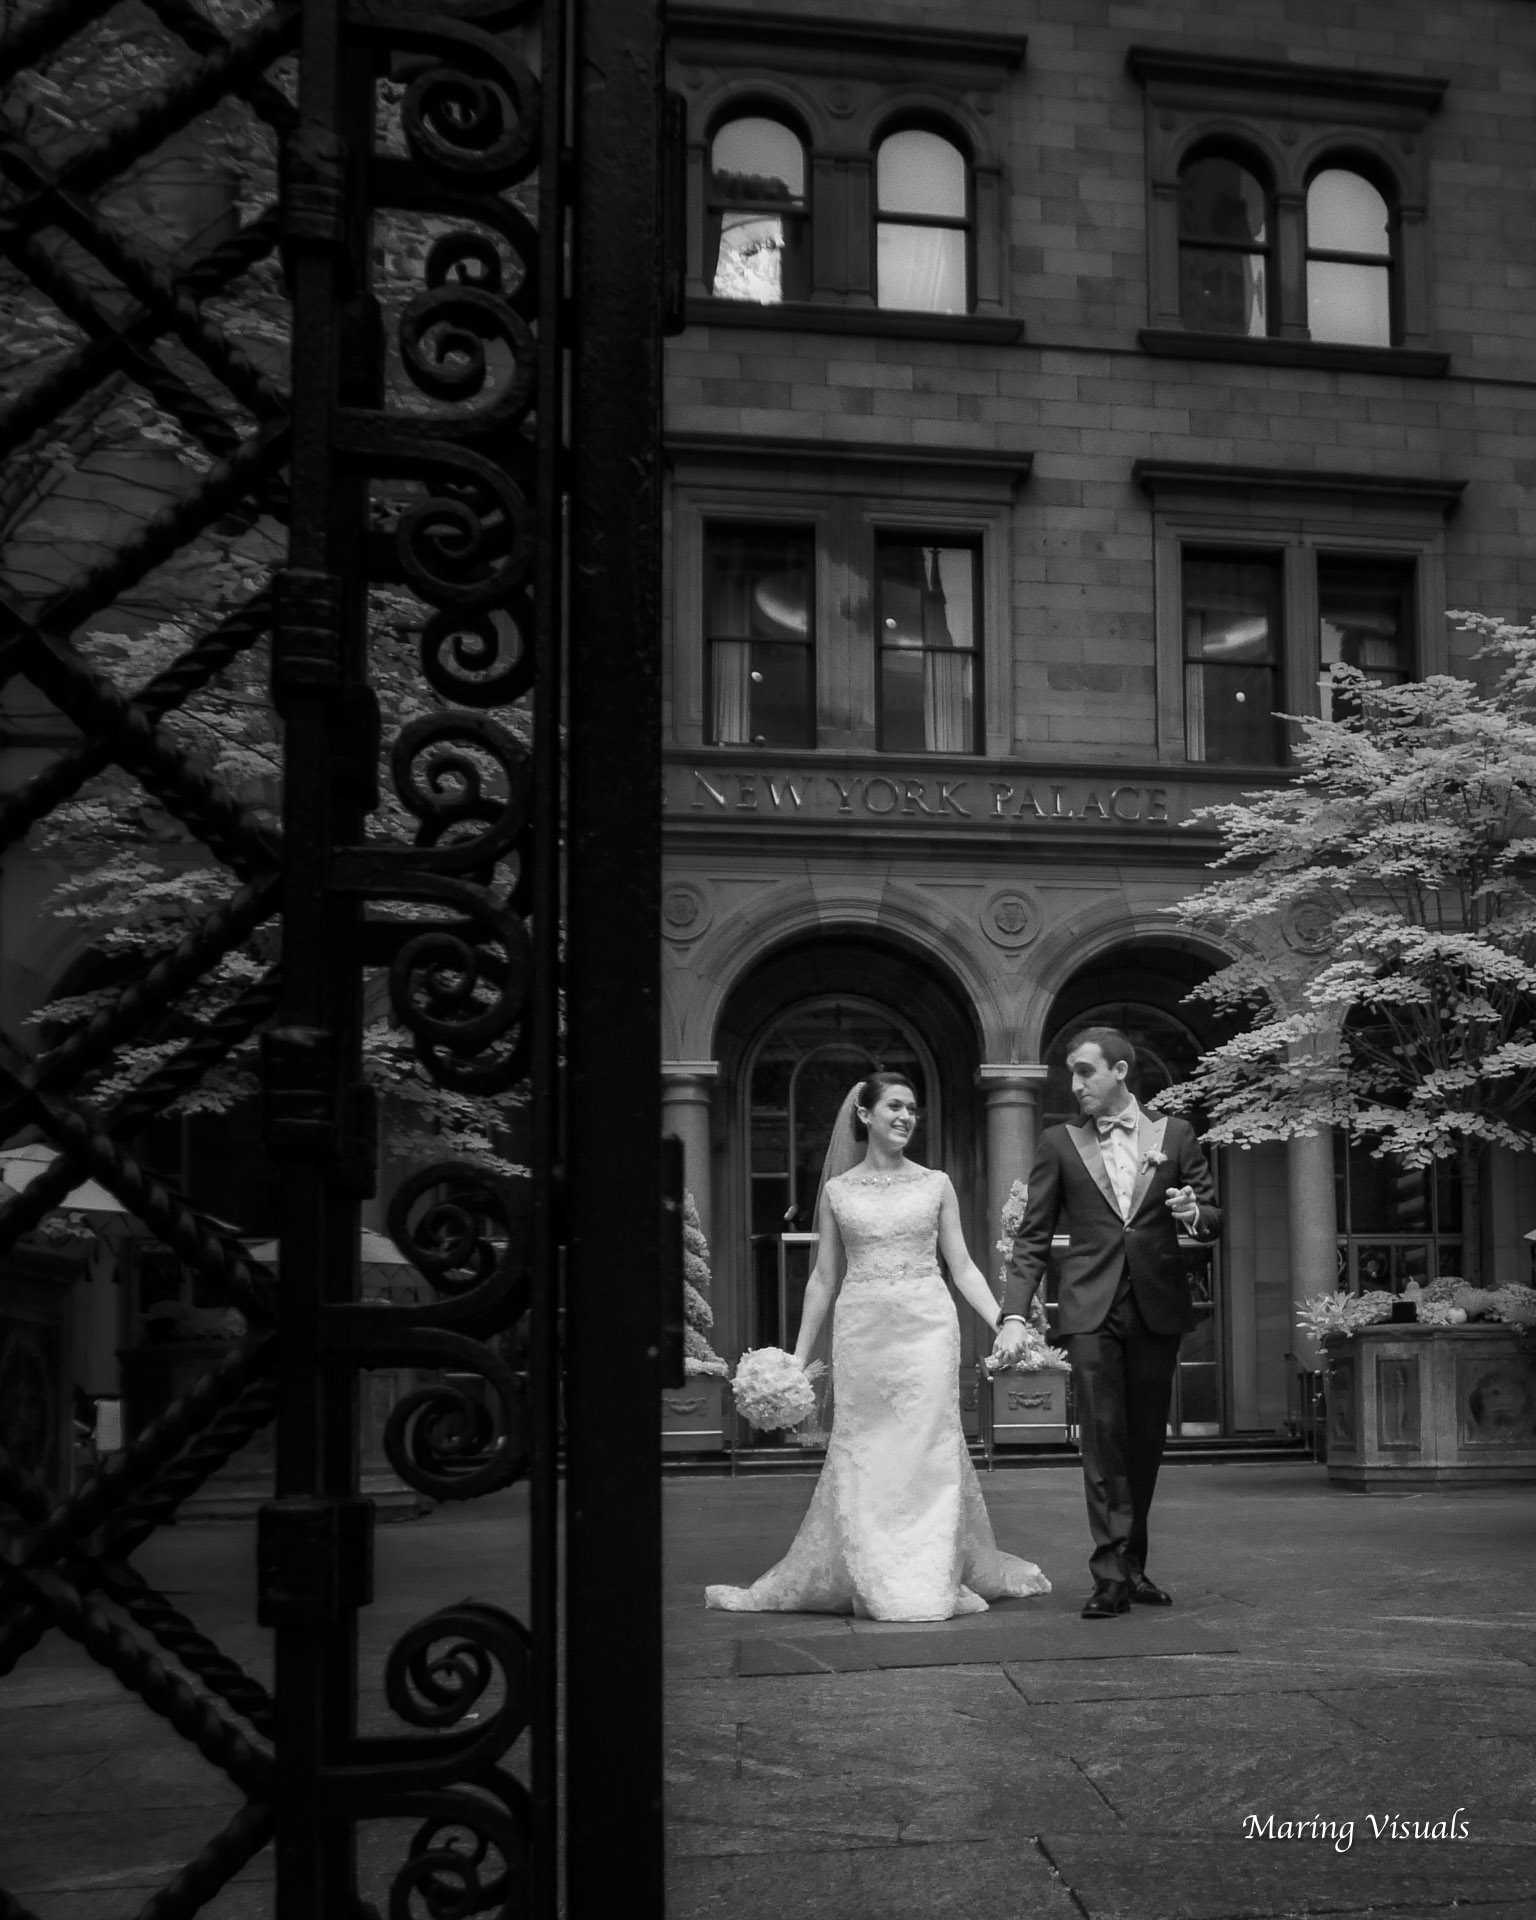 Lotte New York Palace Wedding 00191.jpg